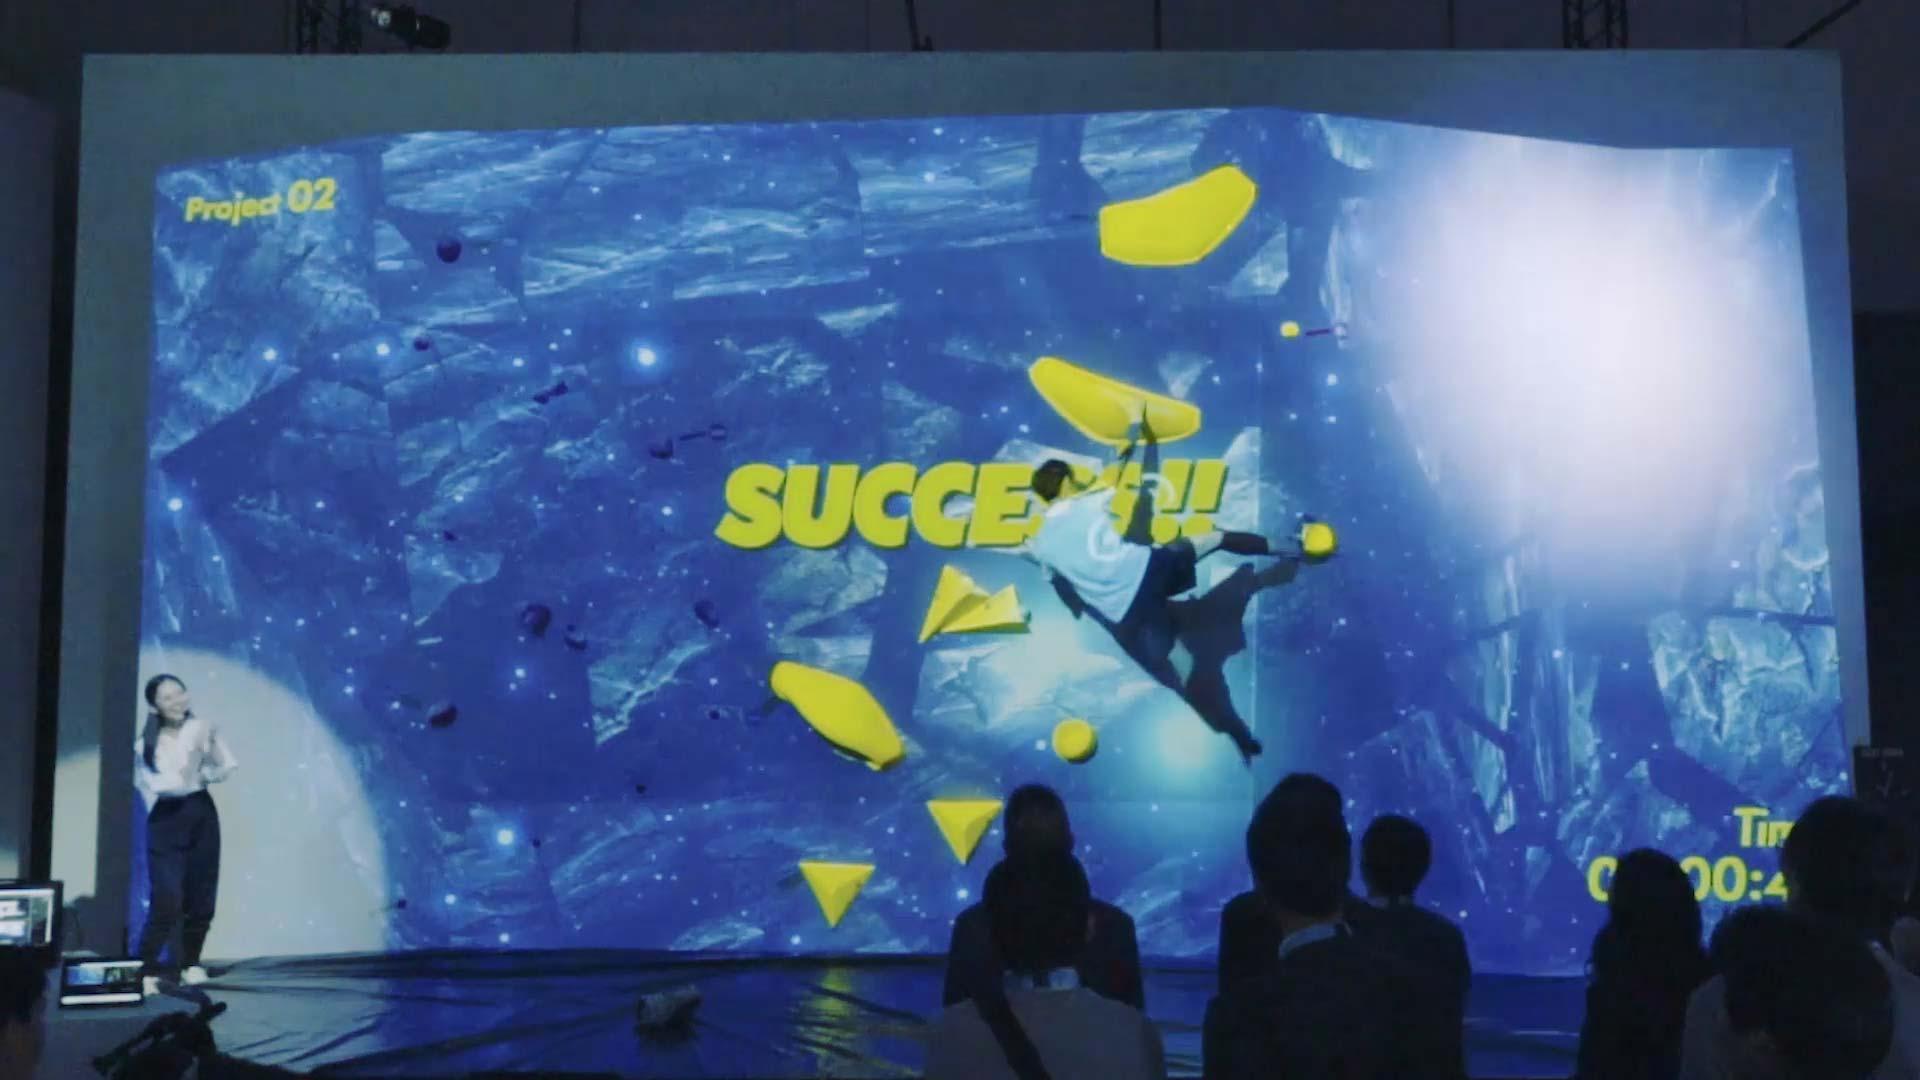 Panasonic 創業100周年記念「クロスバリューイノベーションフォーラム2018」ボルダリング演出